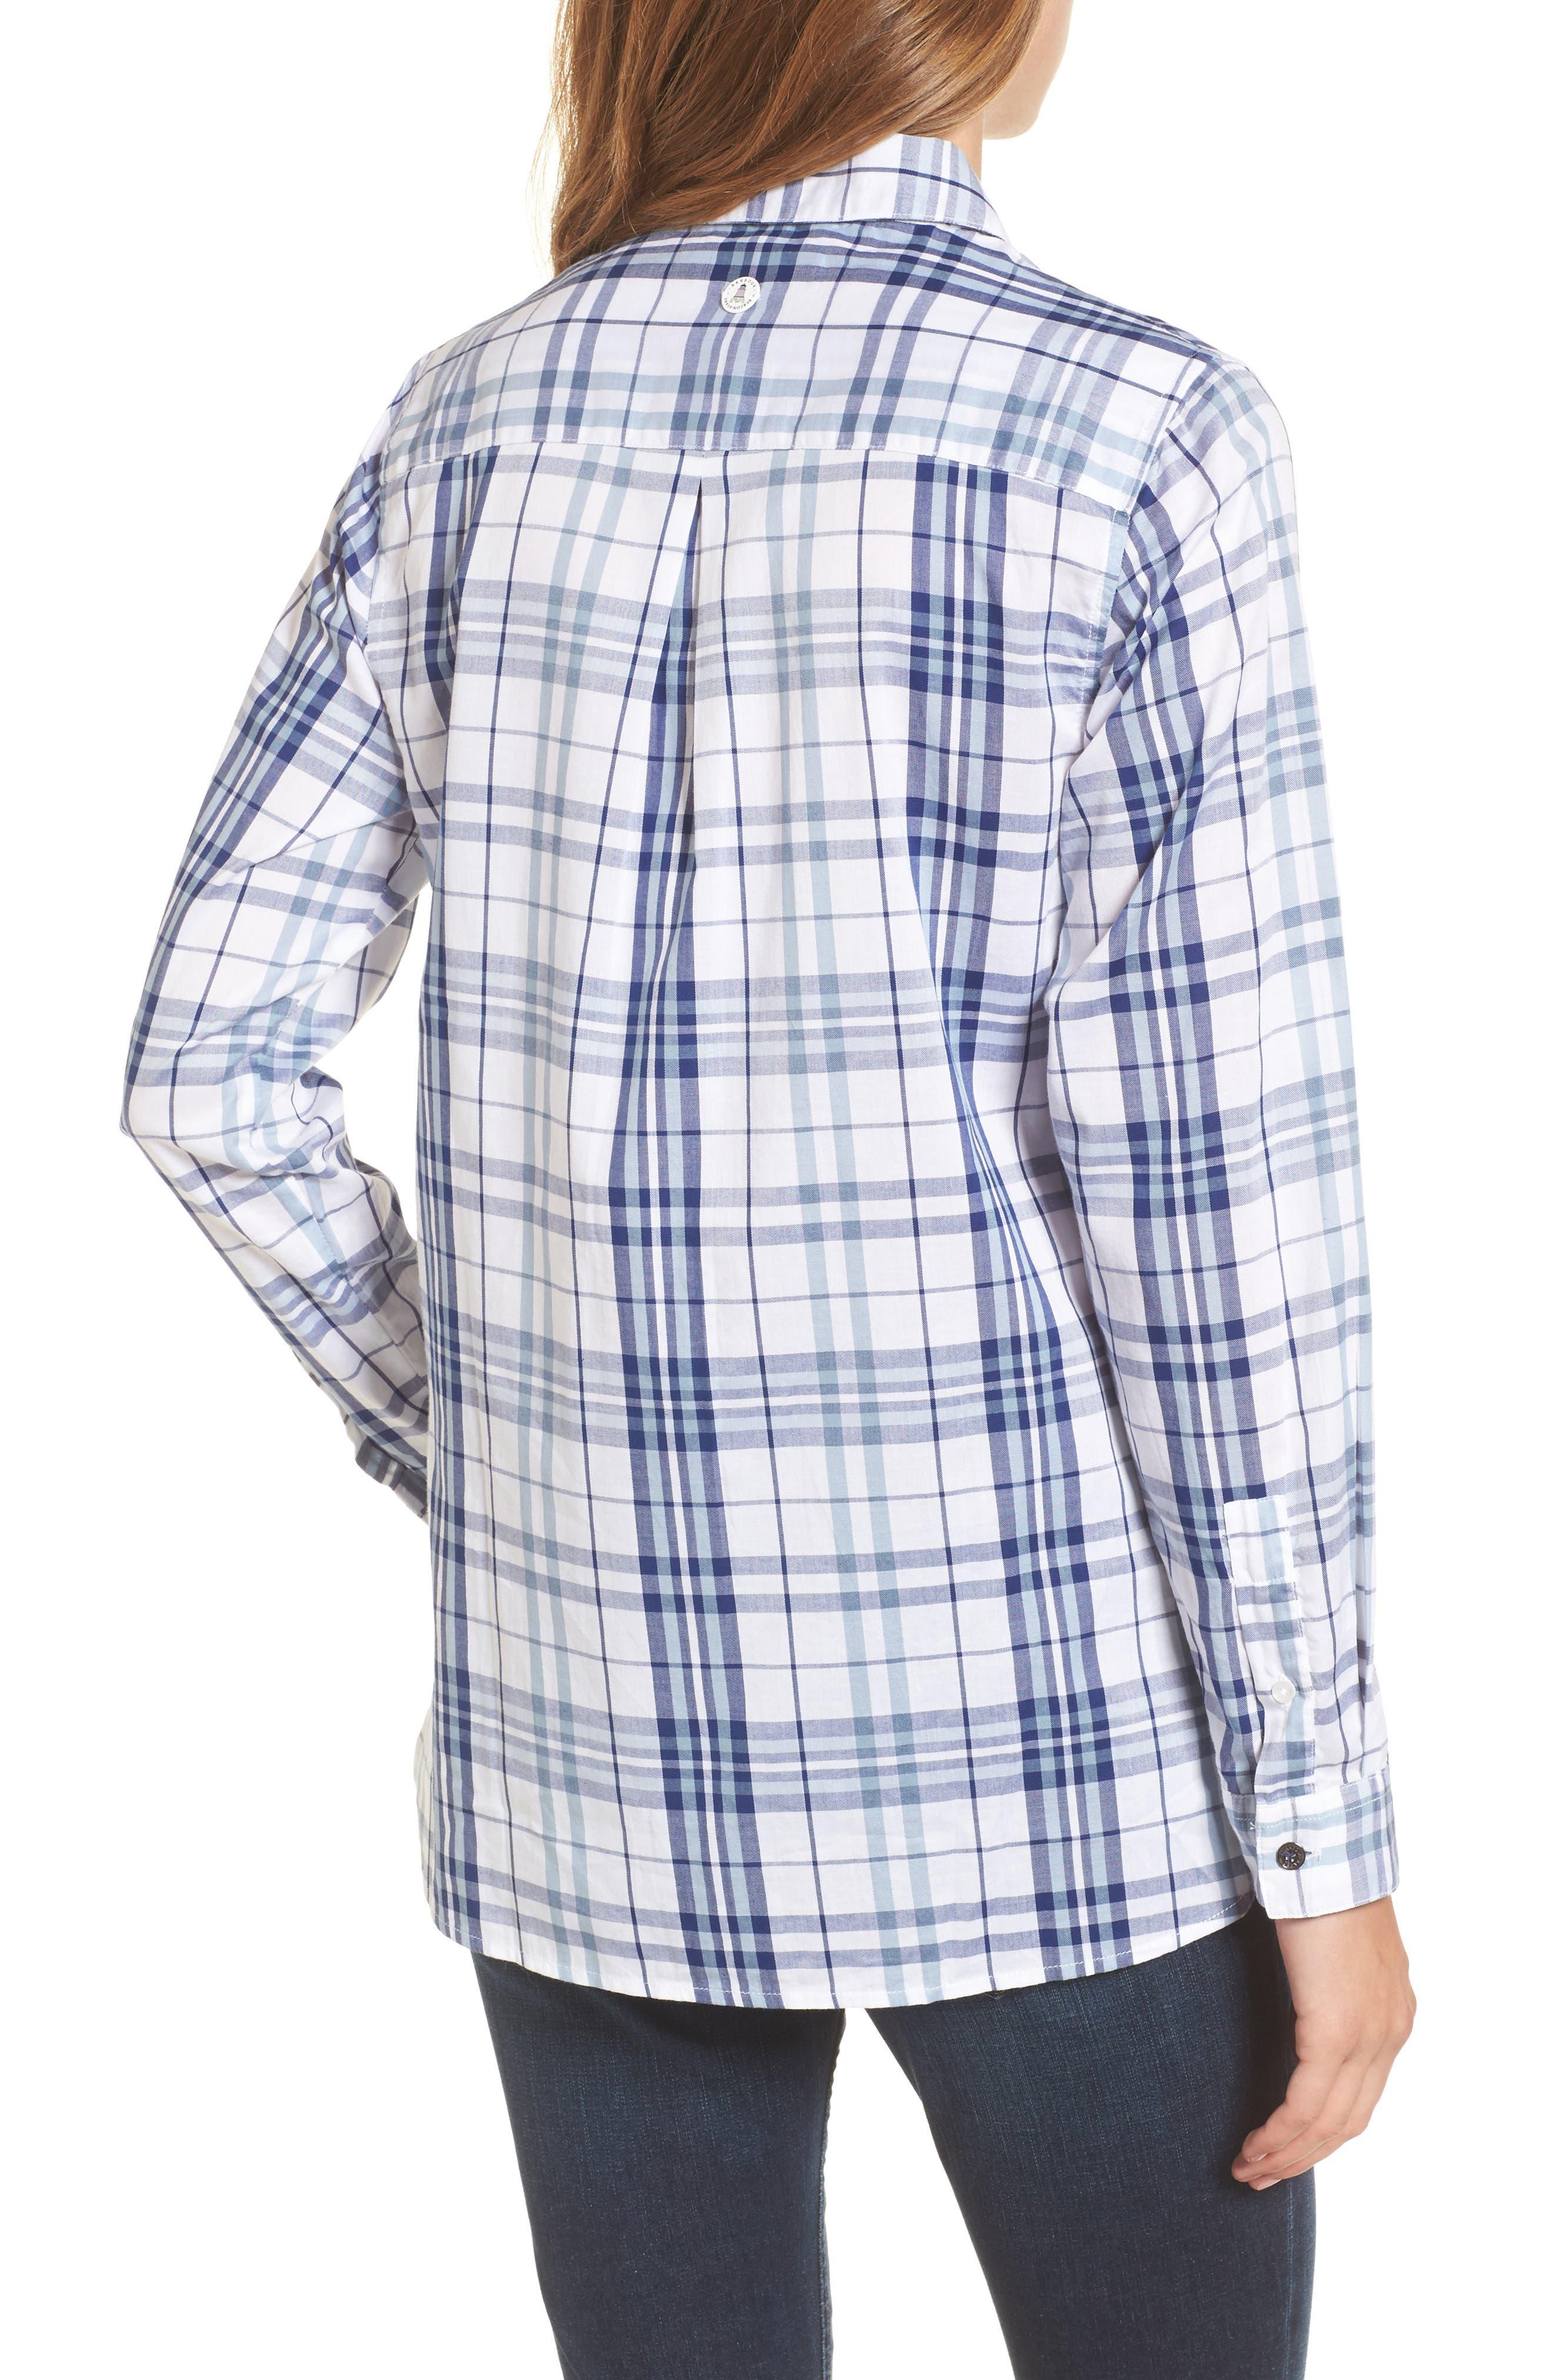 Selsey Plaid Shirt,                             Alternate thumbnail 2, color,                             White/ Coastal Blue